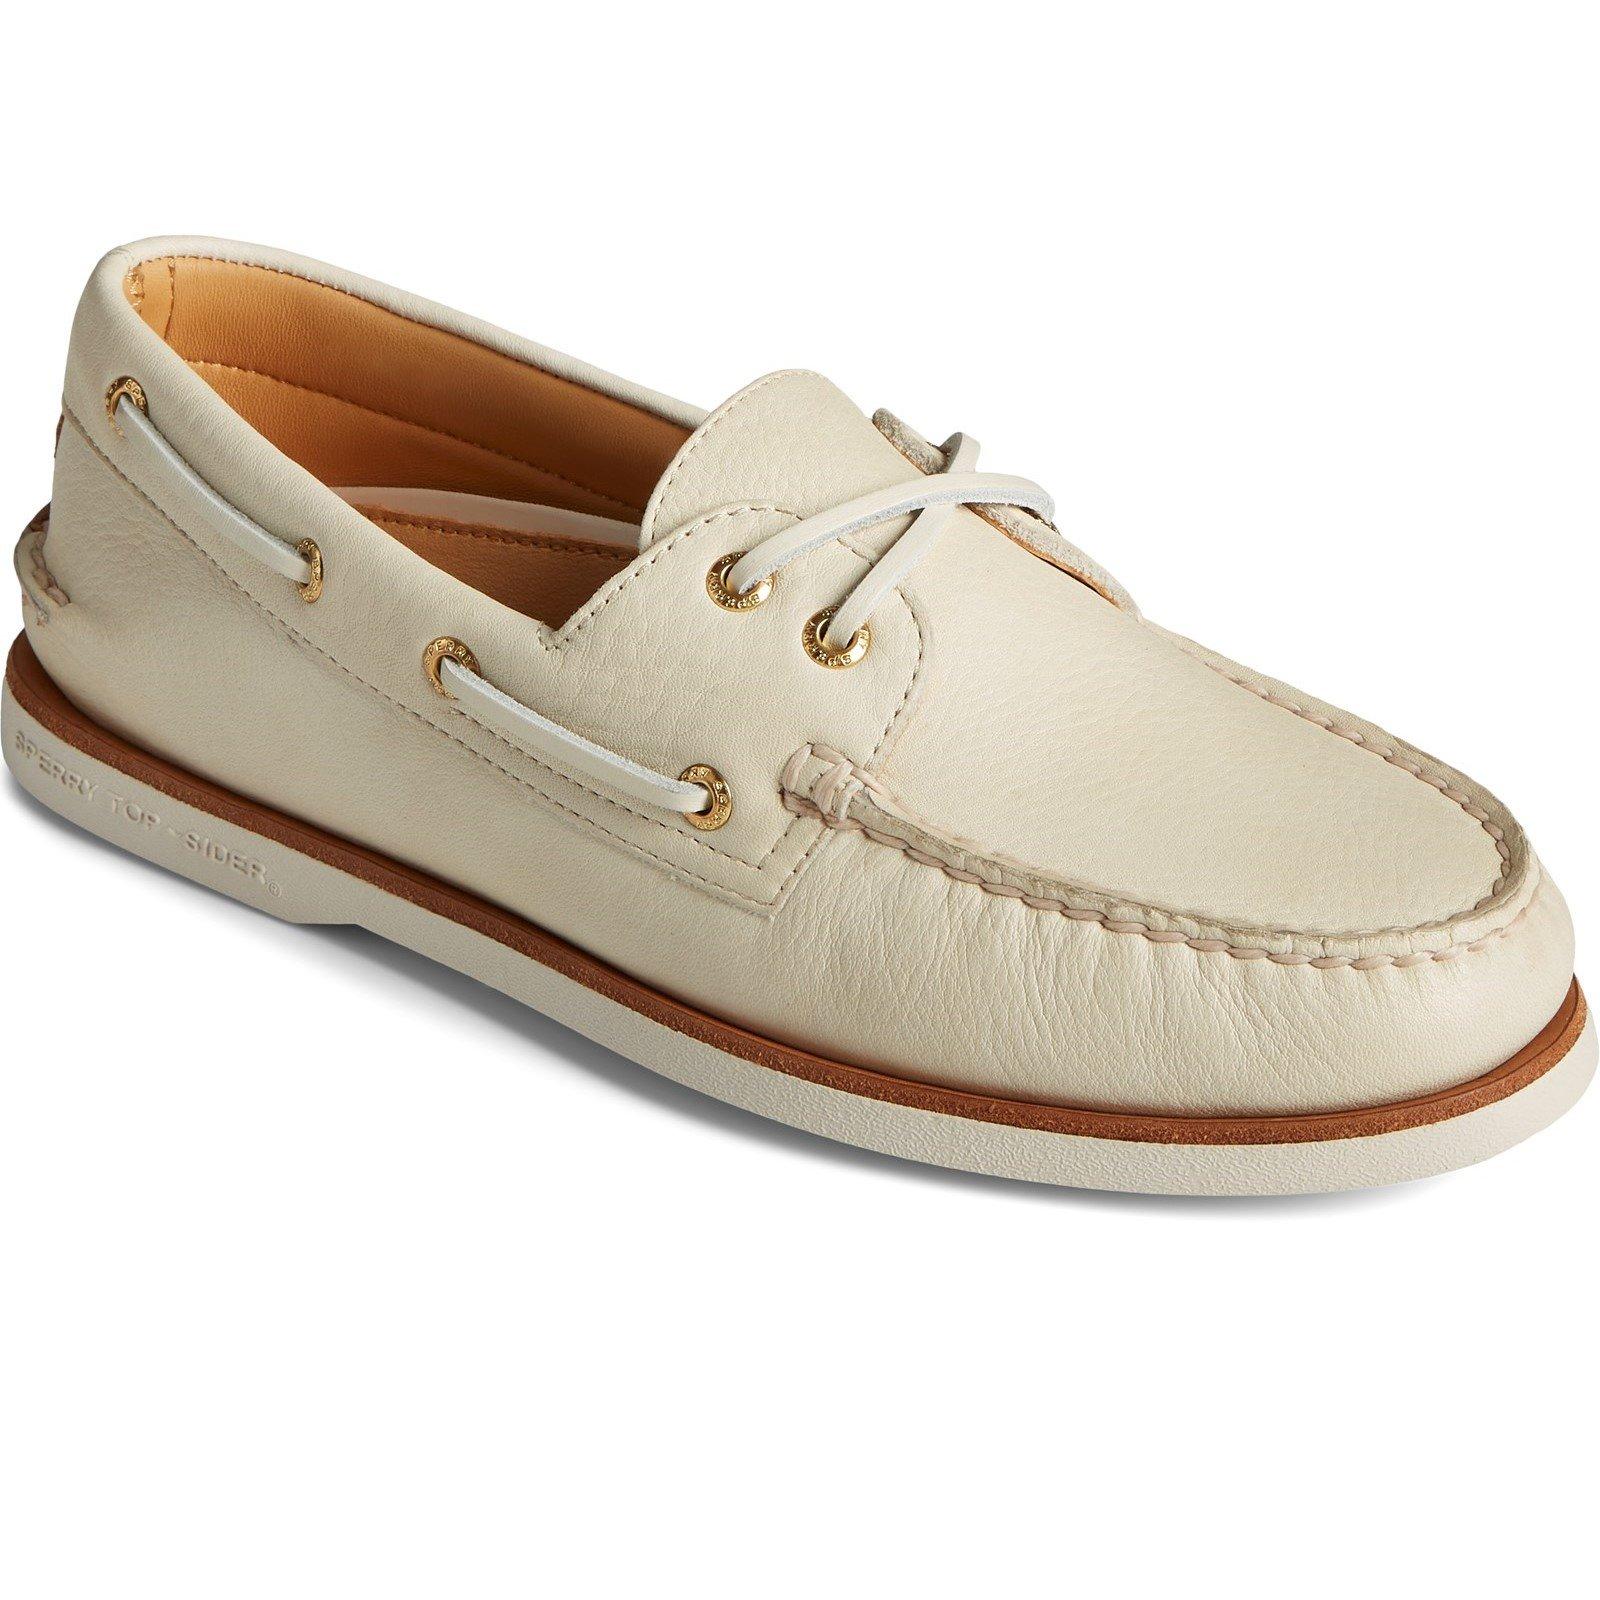 Sperry Men's A/O 2-Eye Boat Shoe Various Colours 32926 - Cream 7